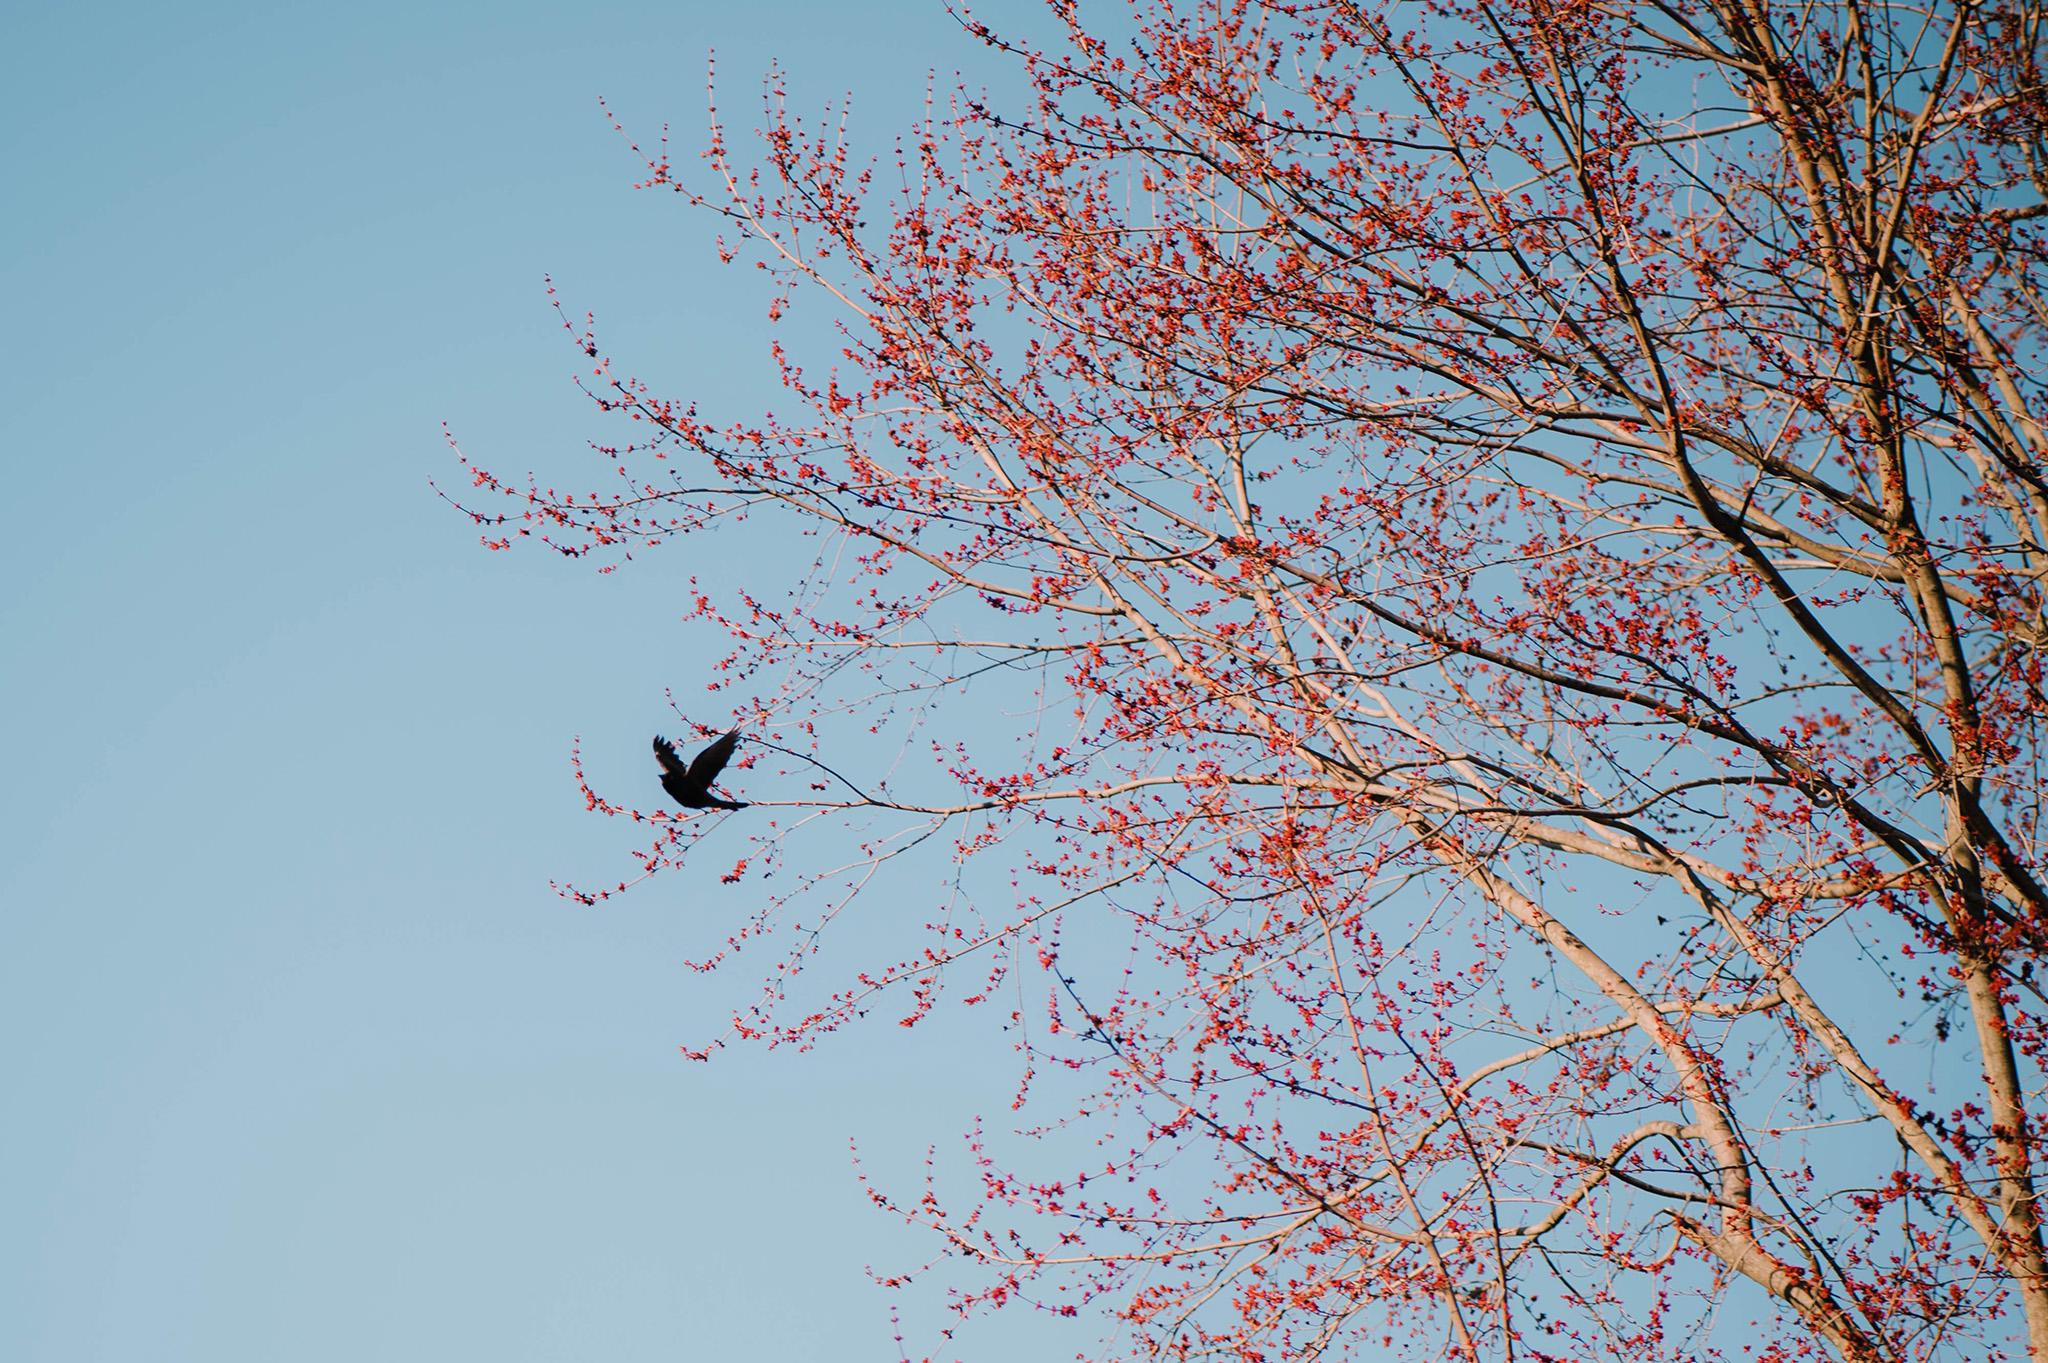 April 5: Sights of spring.